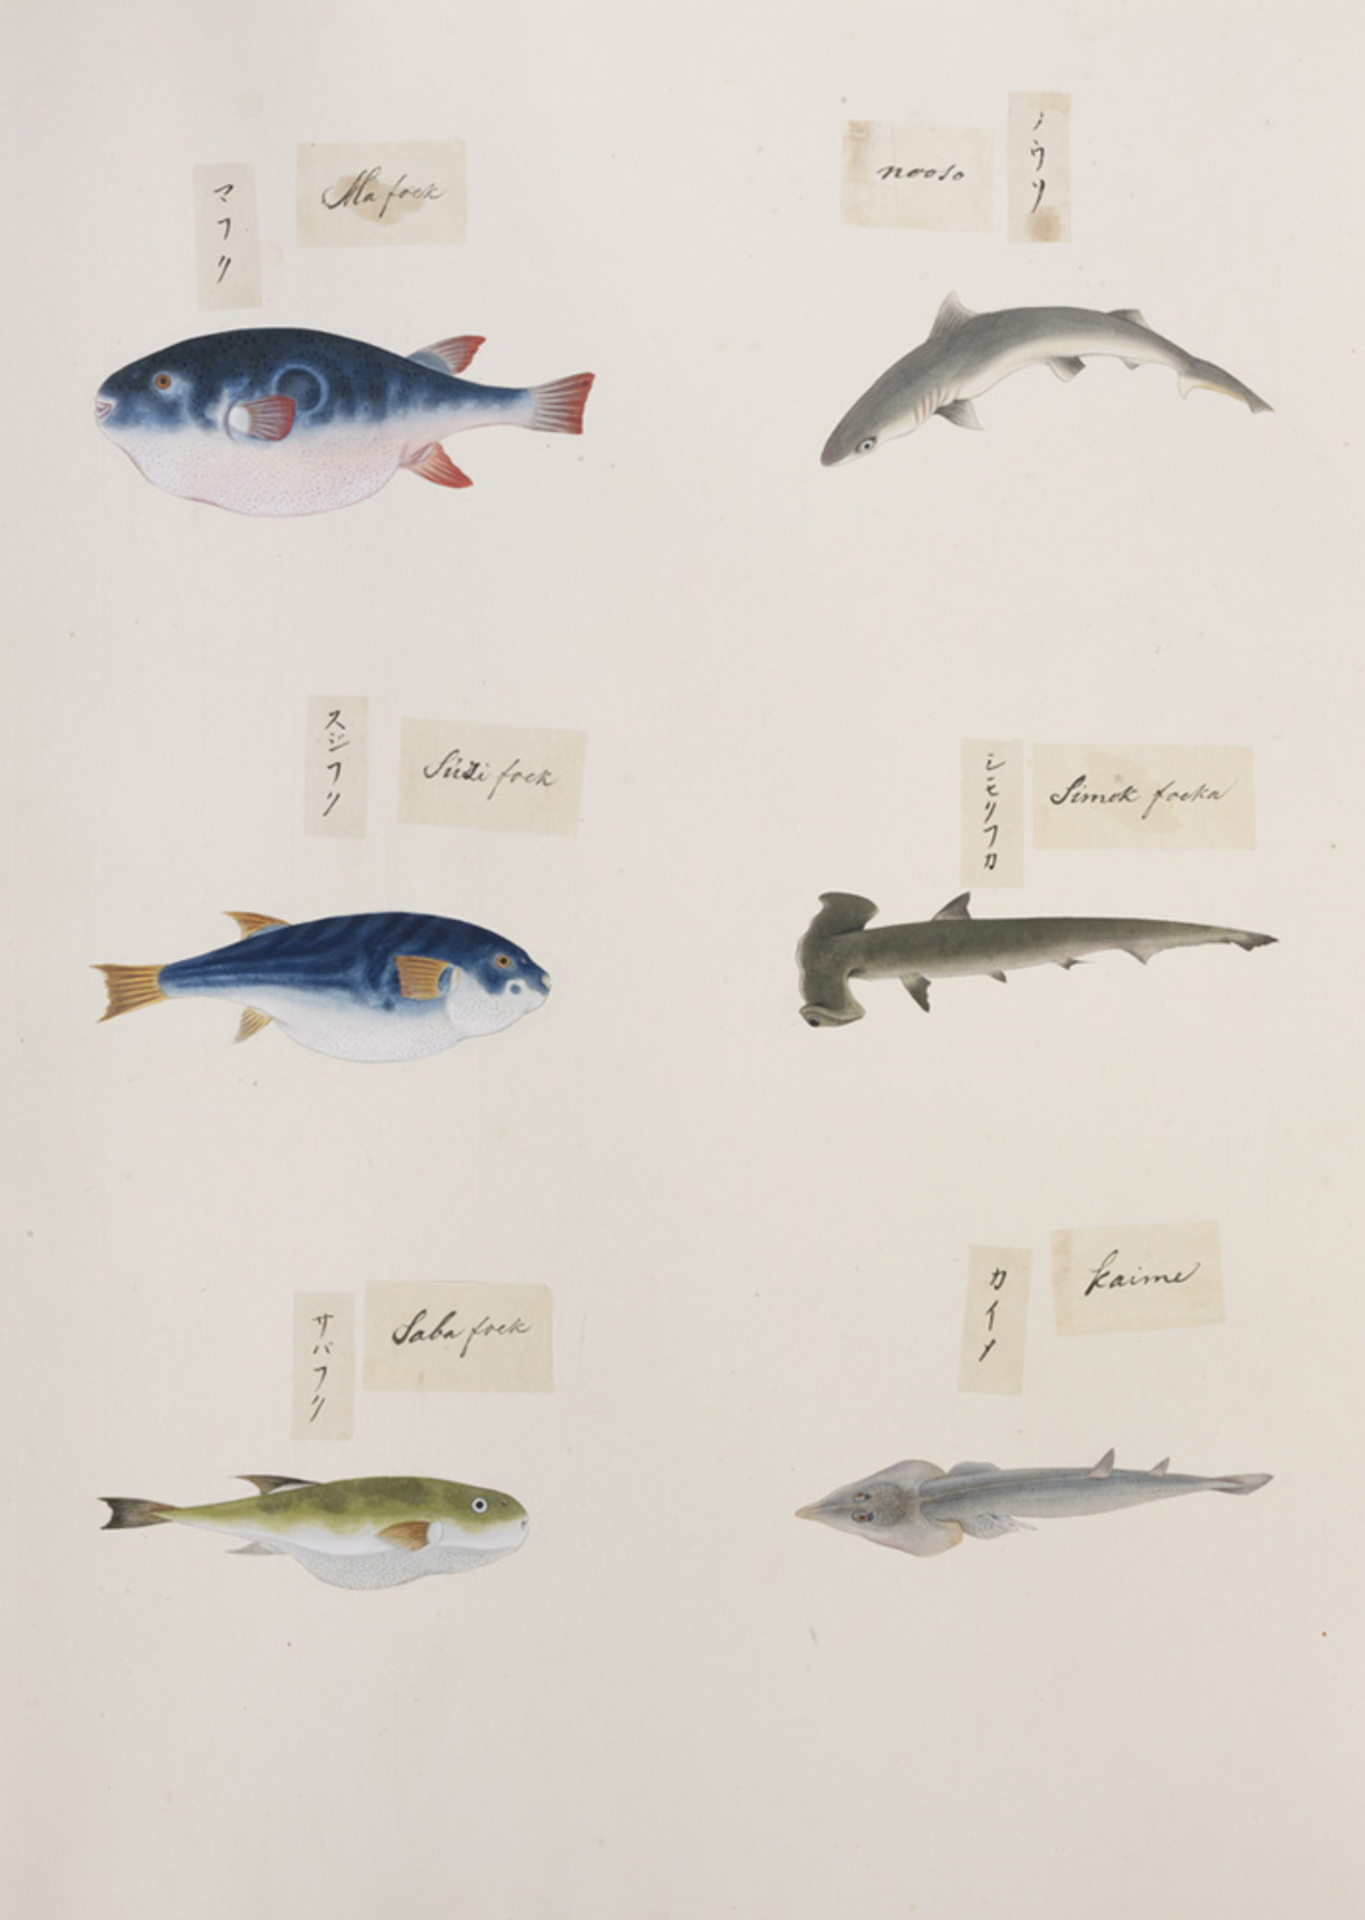 RMNH.ART.320 | Rhipbatos schlegeli